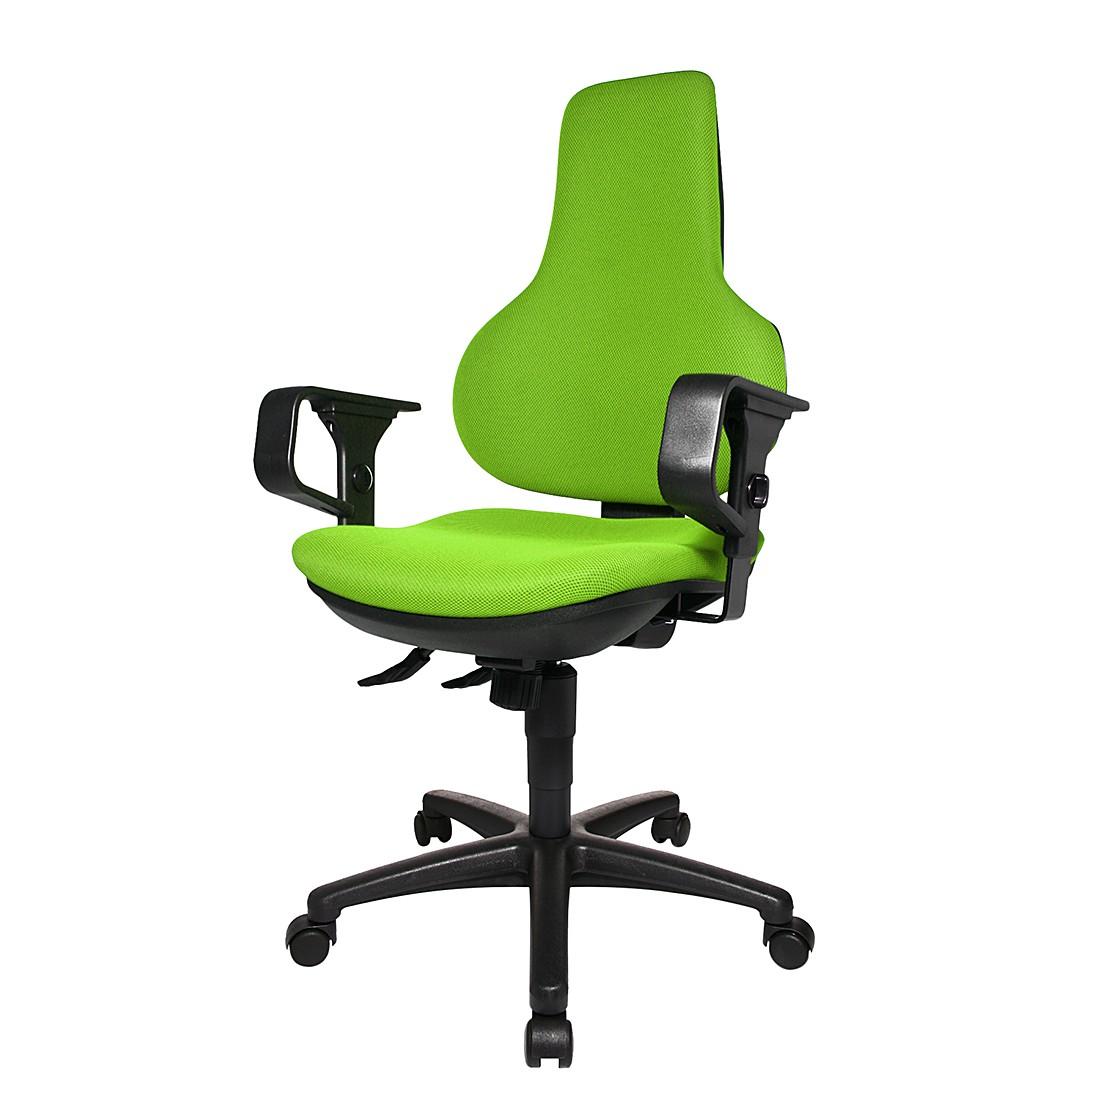 home24 Buerodrehstuhl Ergo Point SY | Büro > Bürostühle und Sessel  > Bürostühle | Topstar